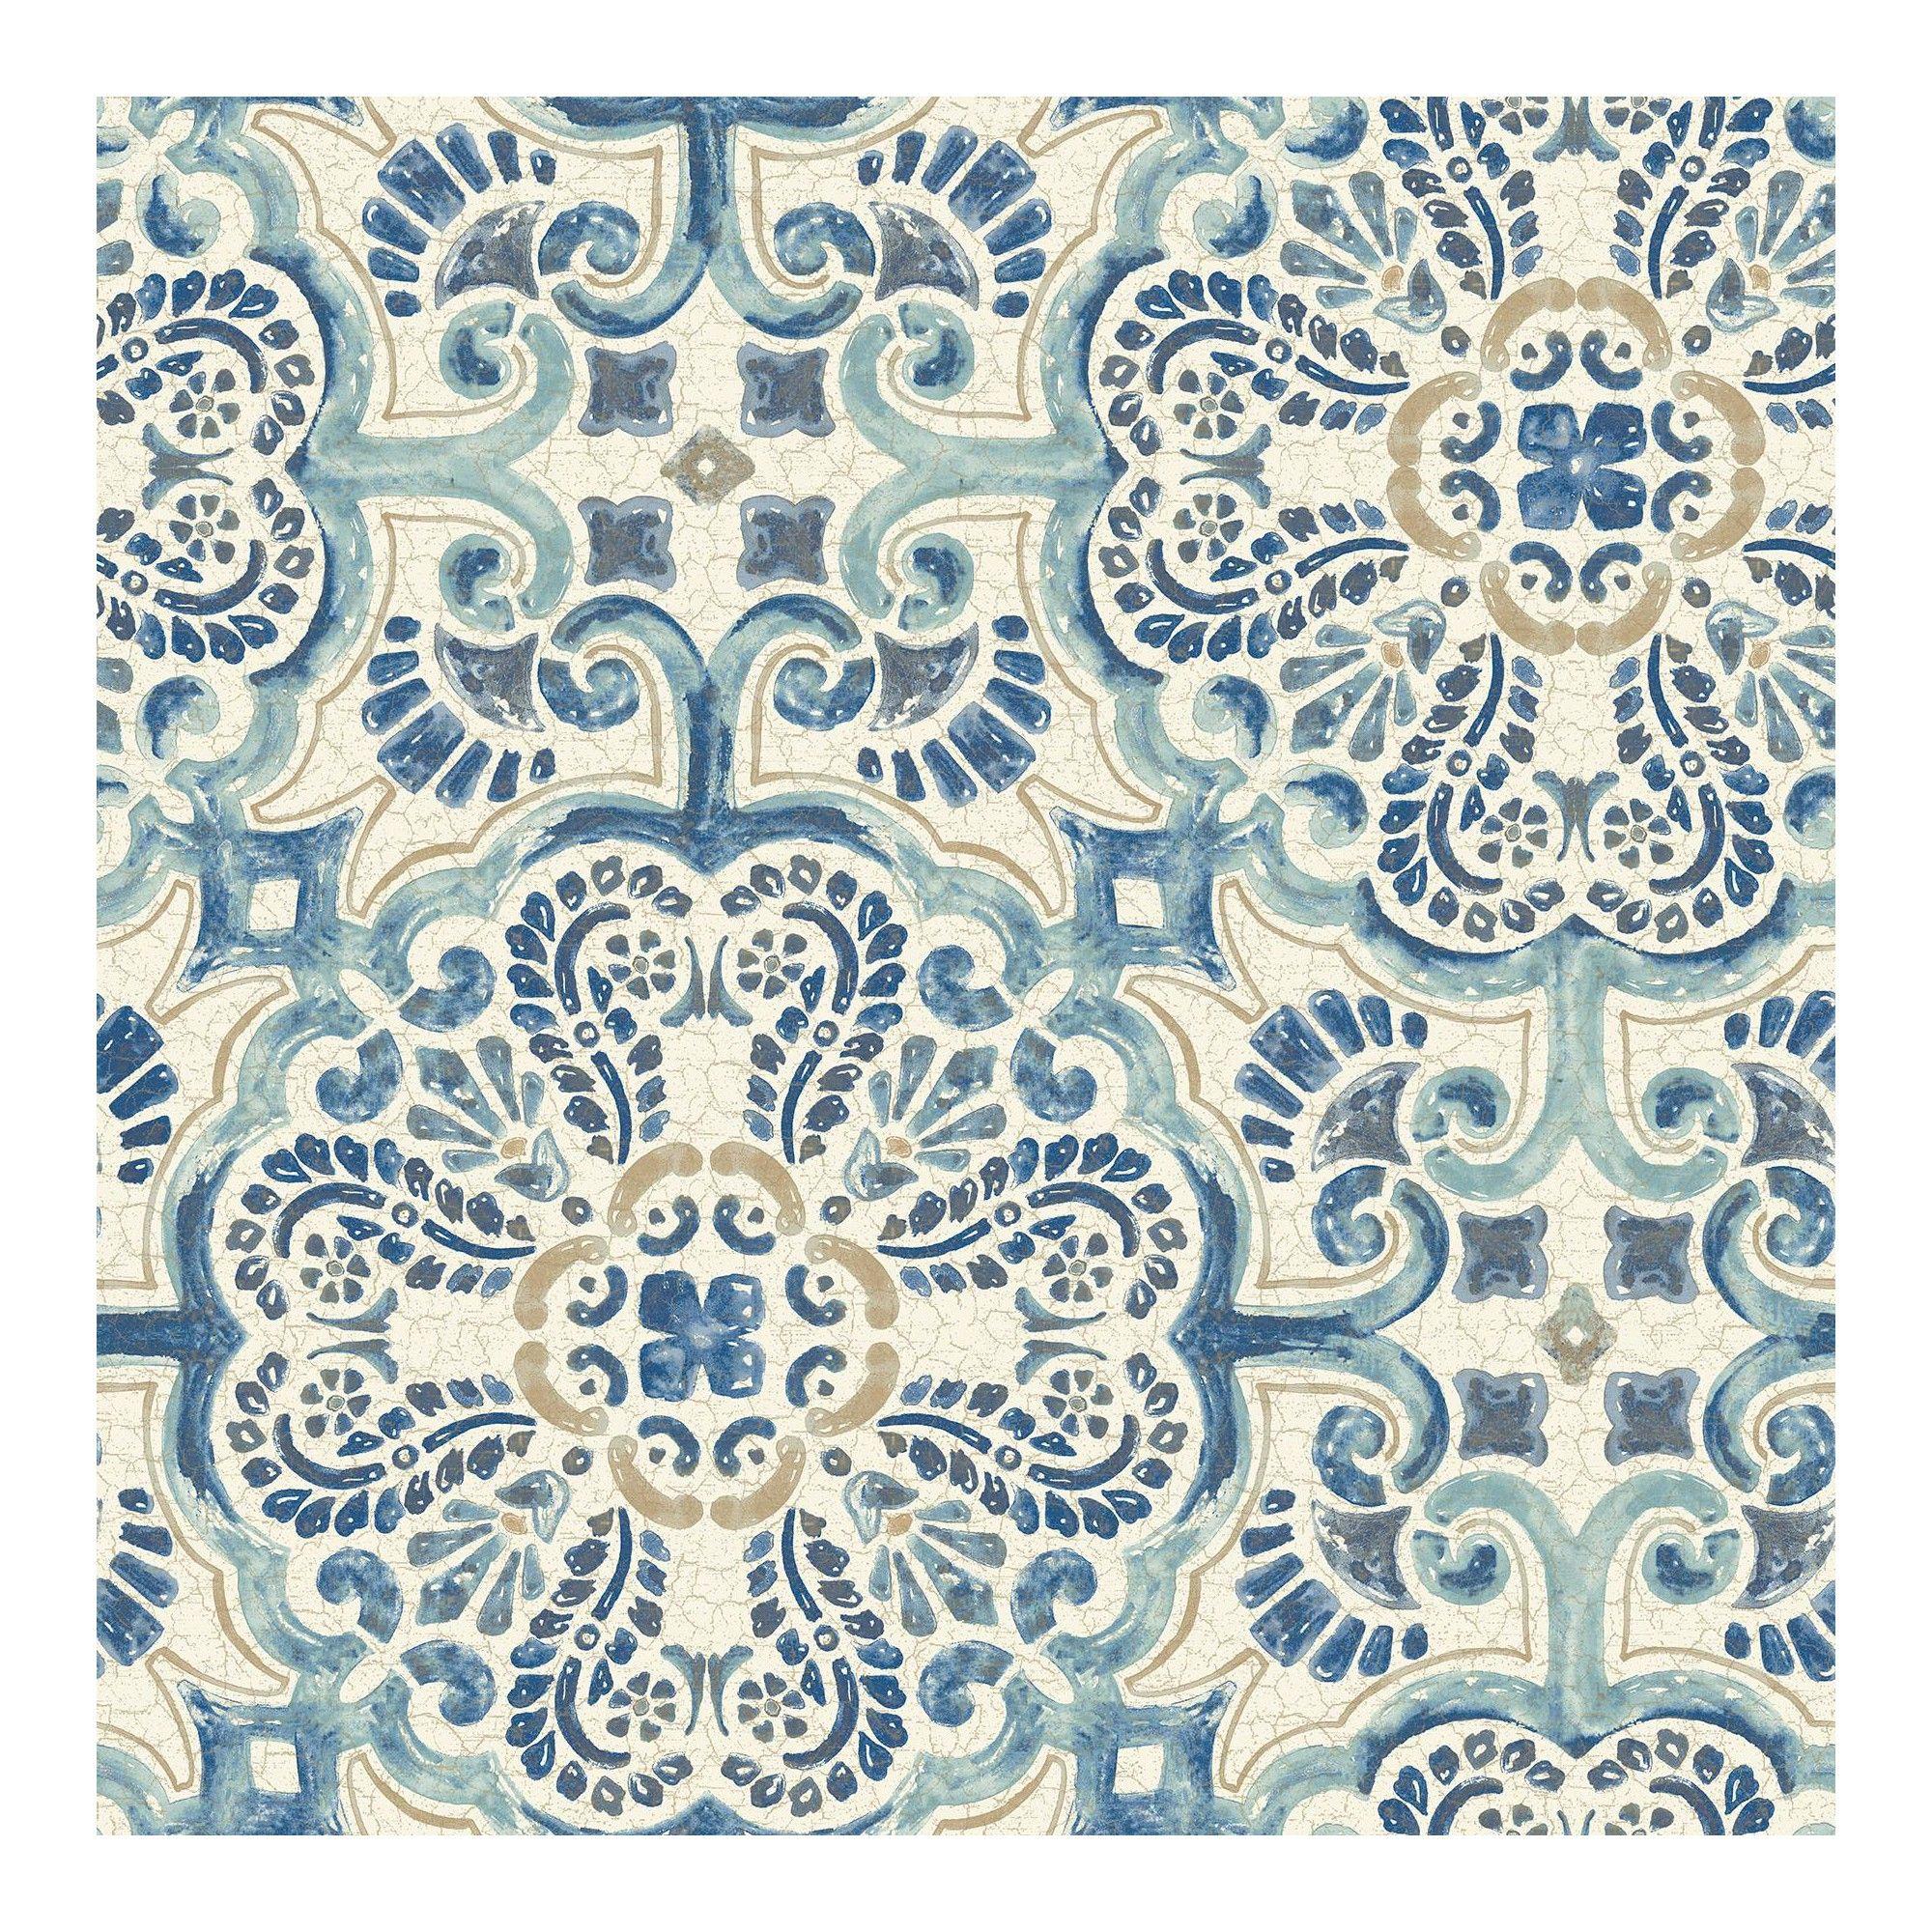 Nuwallpaper Florentine Tile Peel Stick Wallpaper Blue Vinyl Wallpaper Peel And Stick Wallpaper Tile Wallpaper